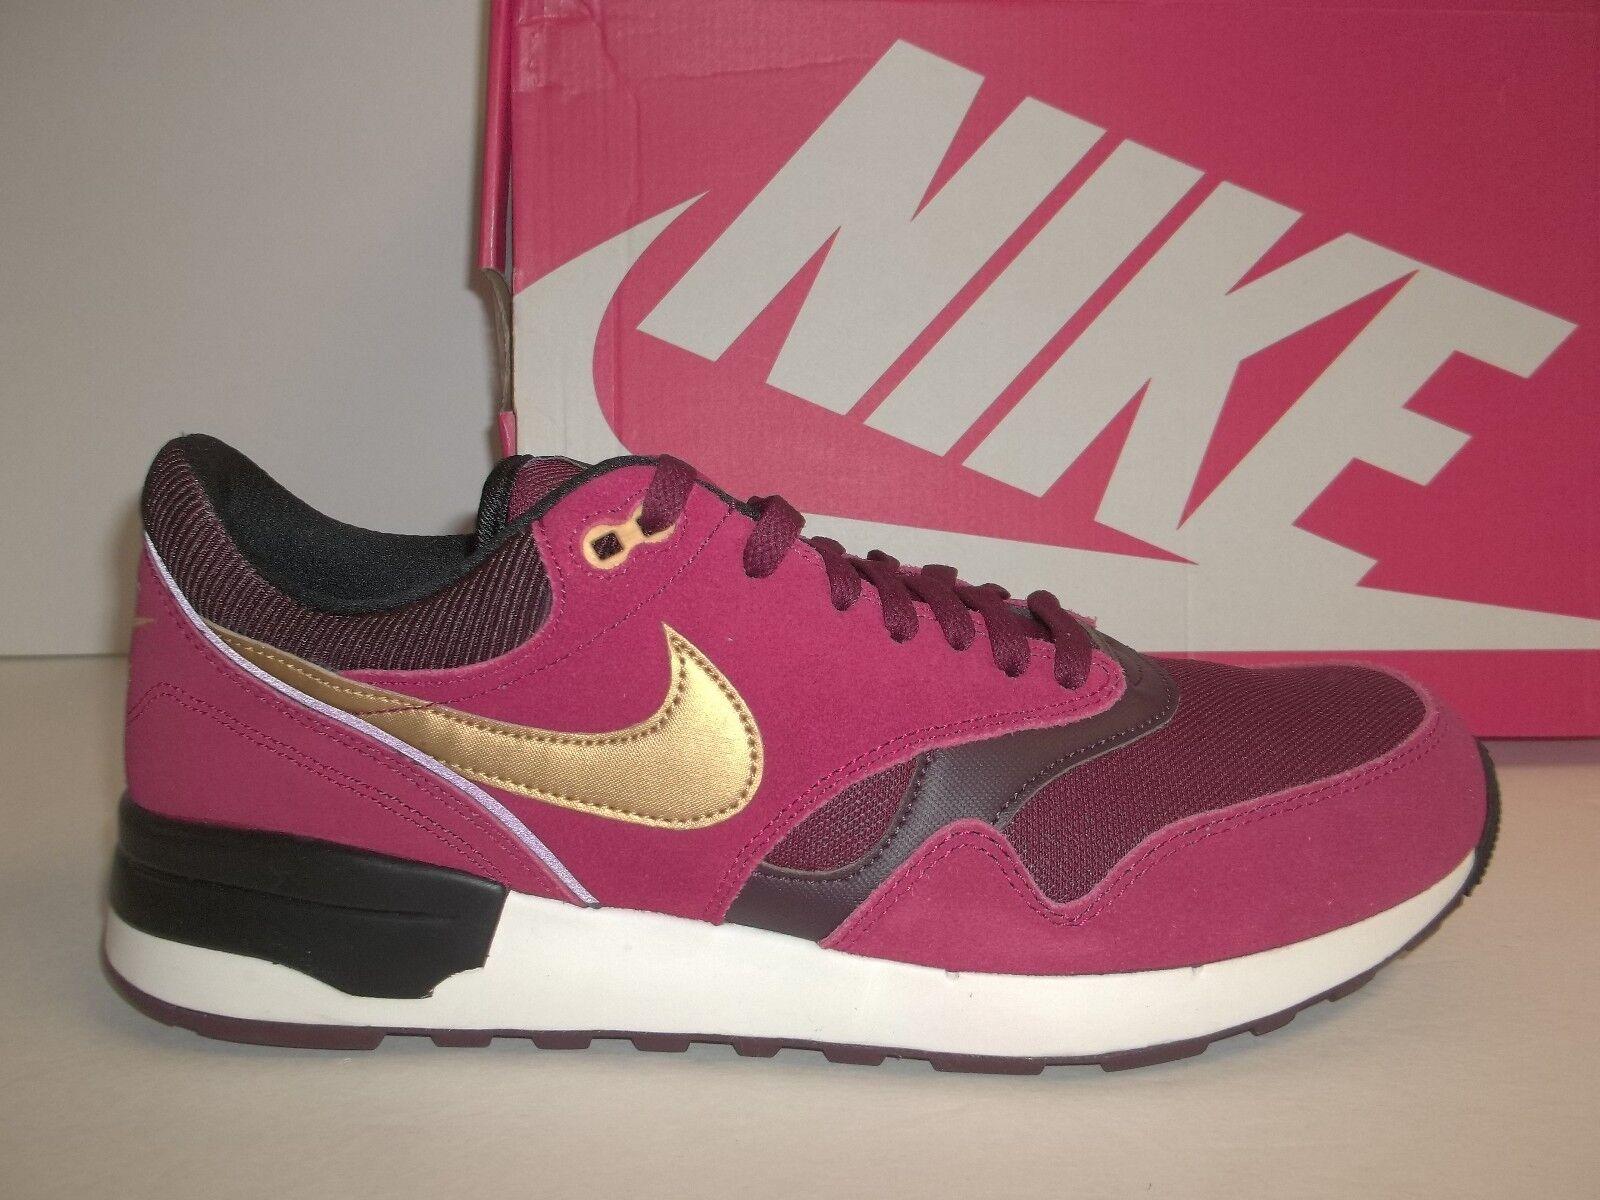 Nike größe 11 leder m luft odyssee rotes leder 11 laufen neue männer nwob Turnschuhe, schuhe 8d643e